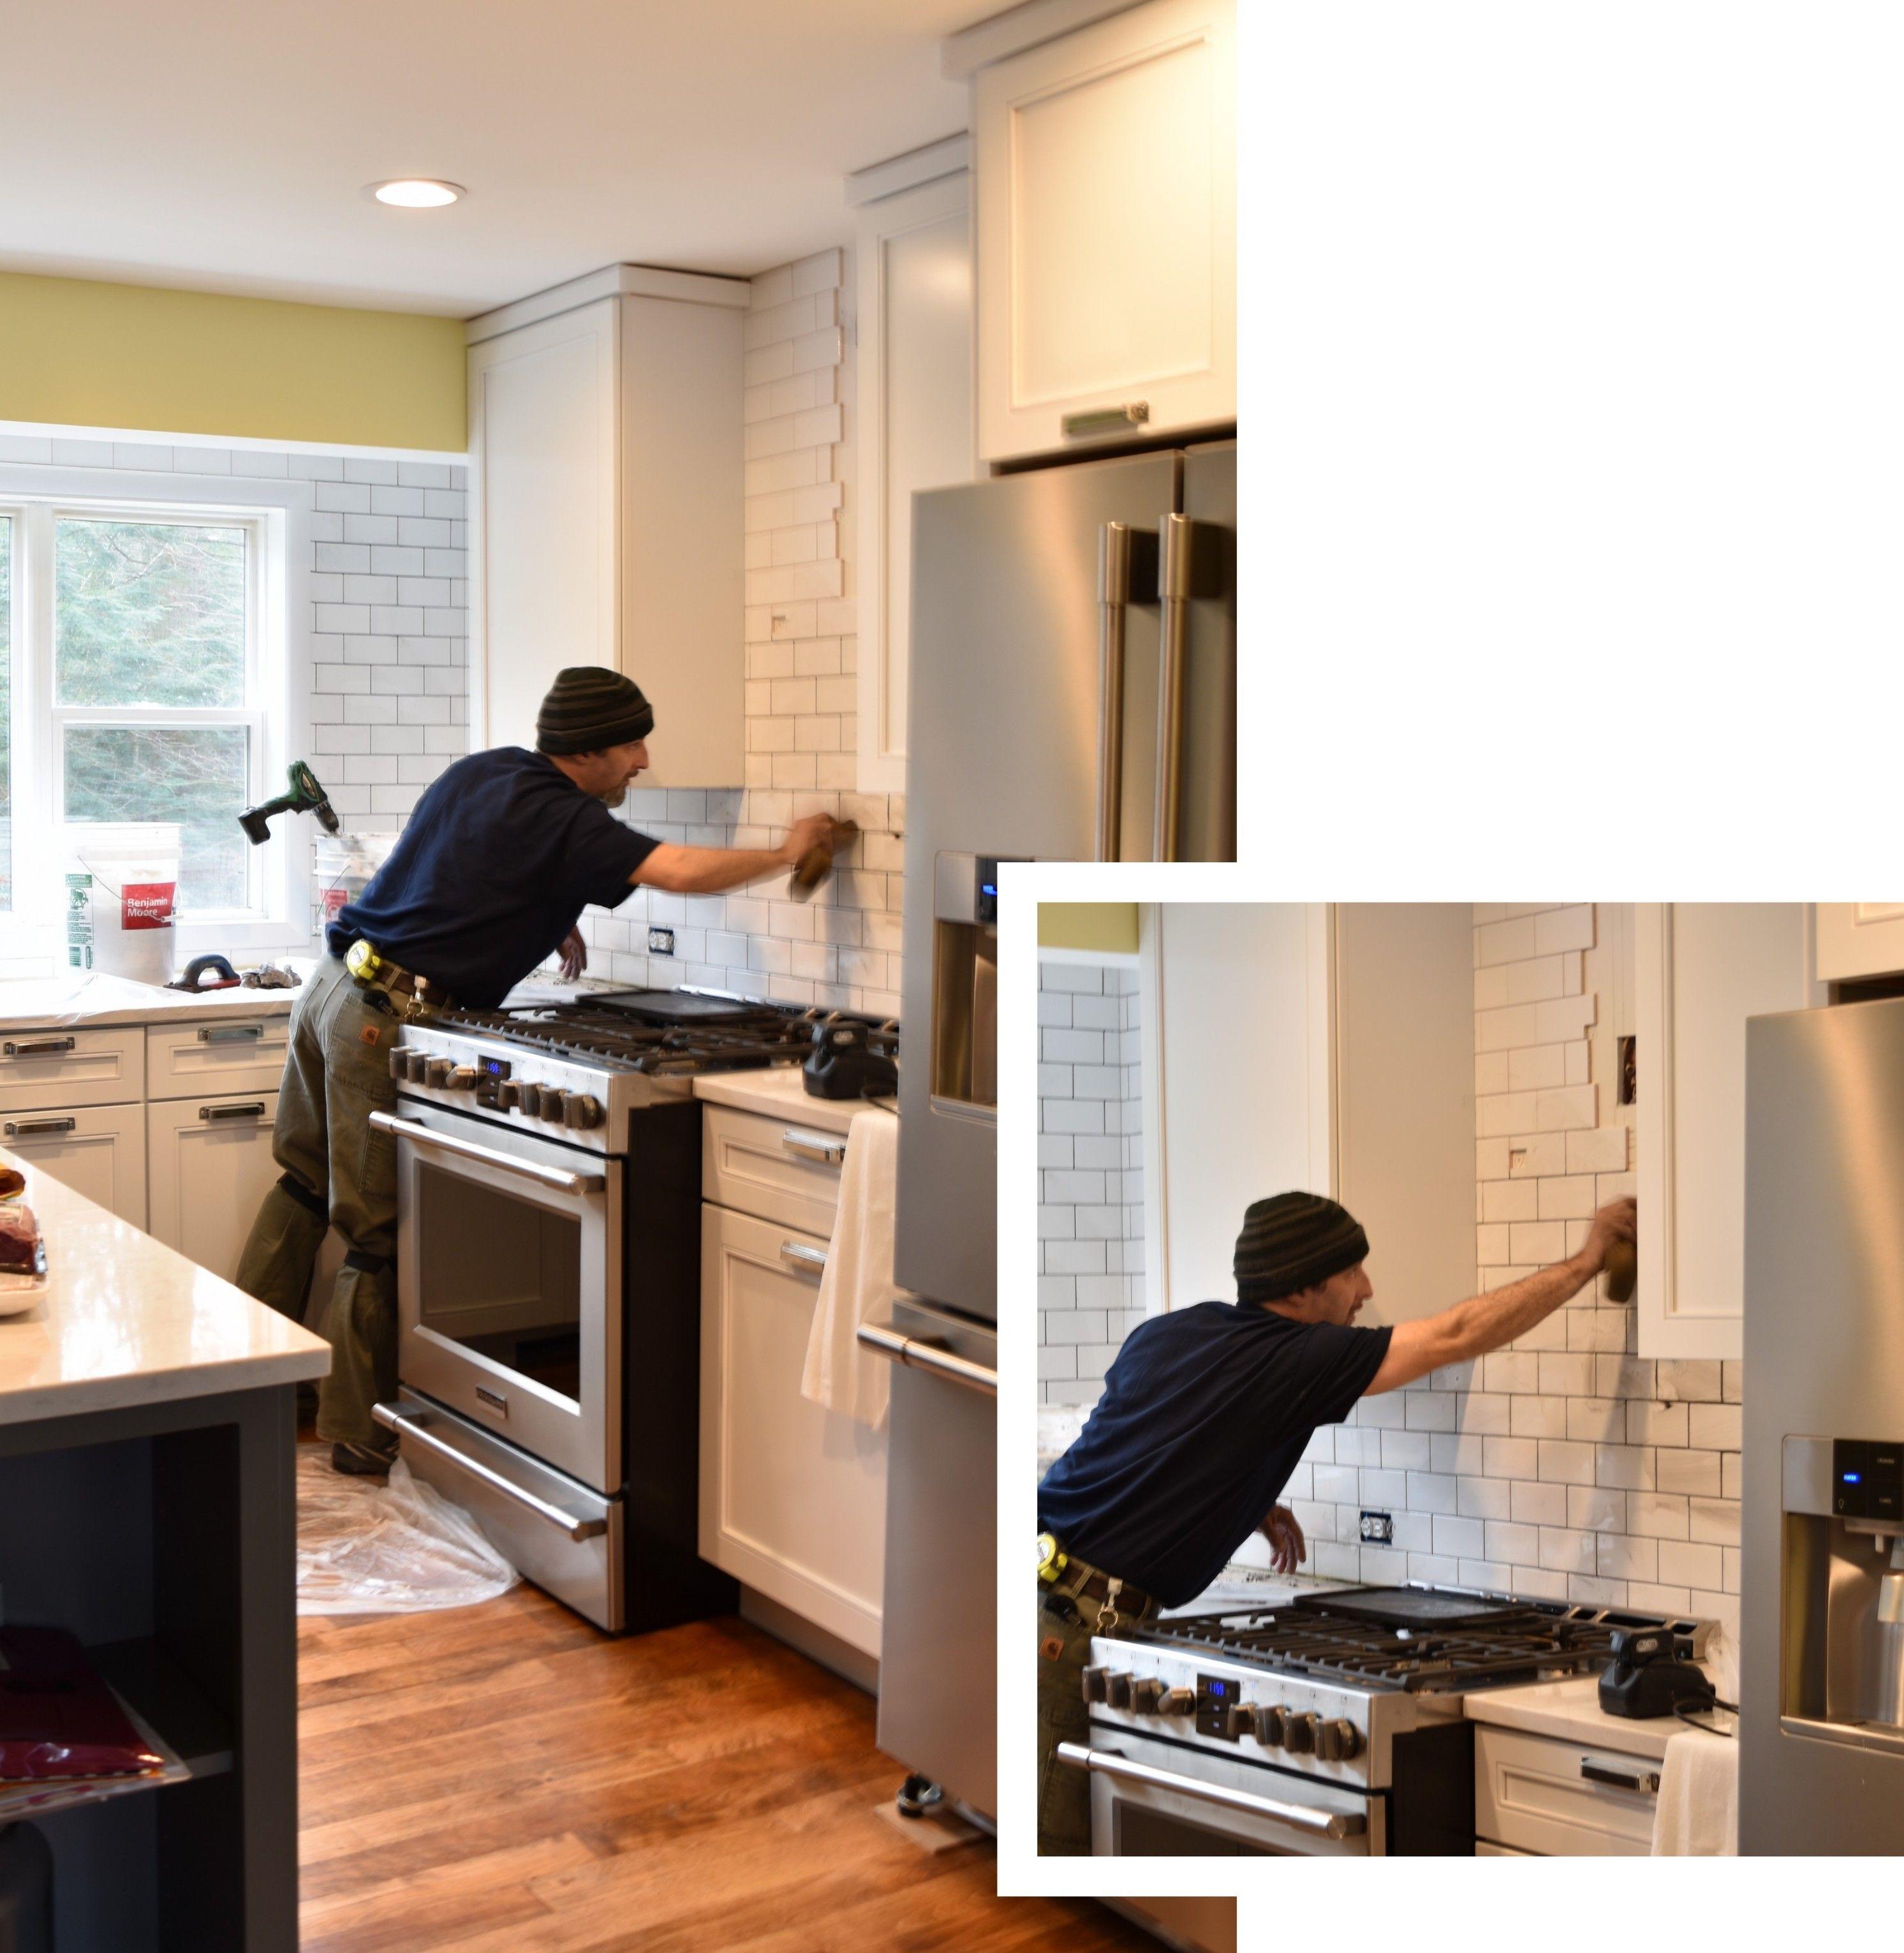 Kitchen Backsplash With Images Subway Tile Backsplash Kitchen